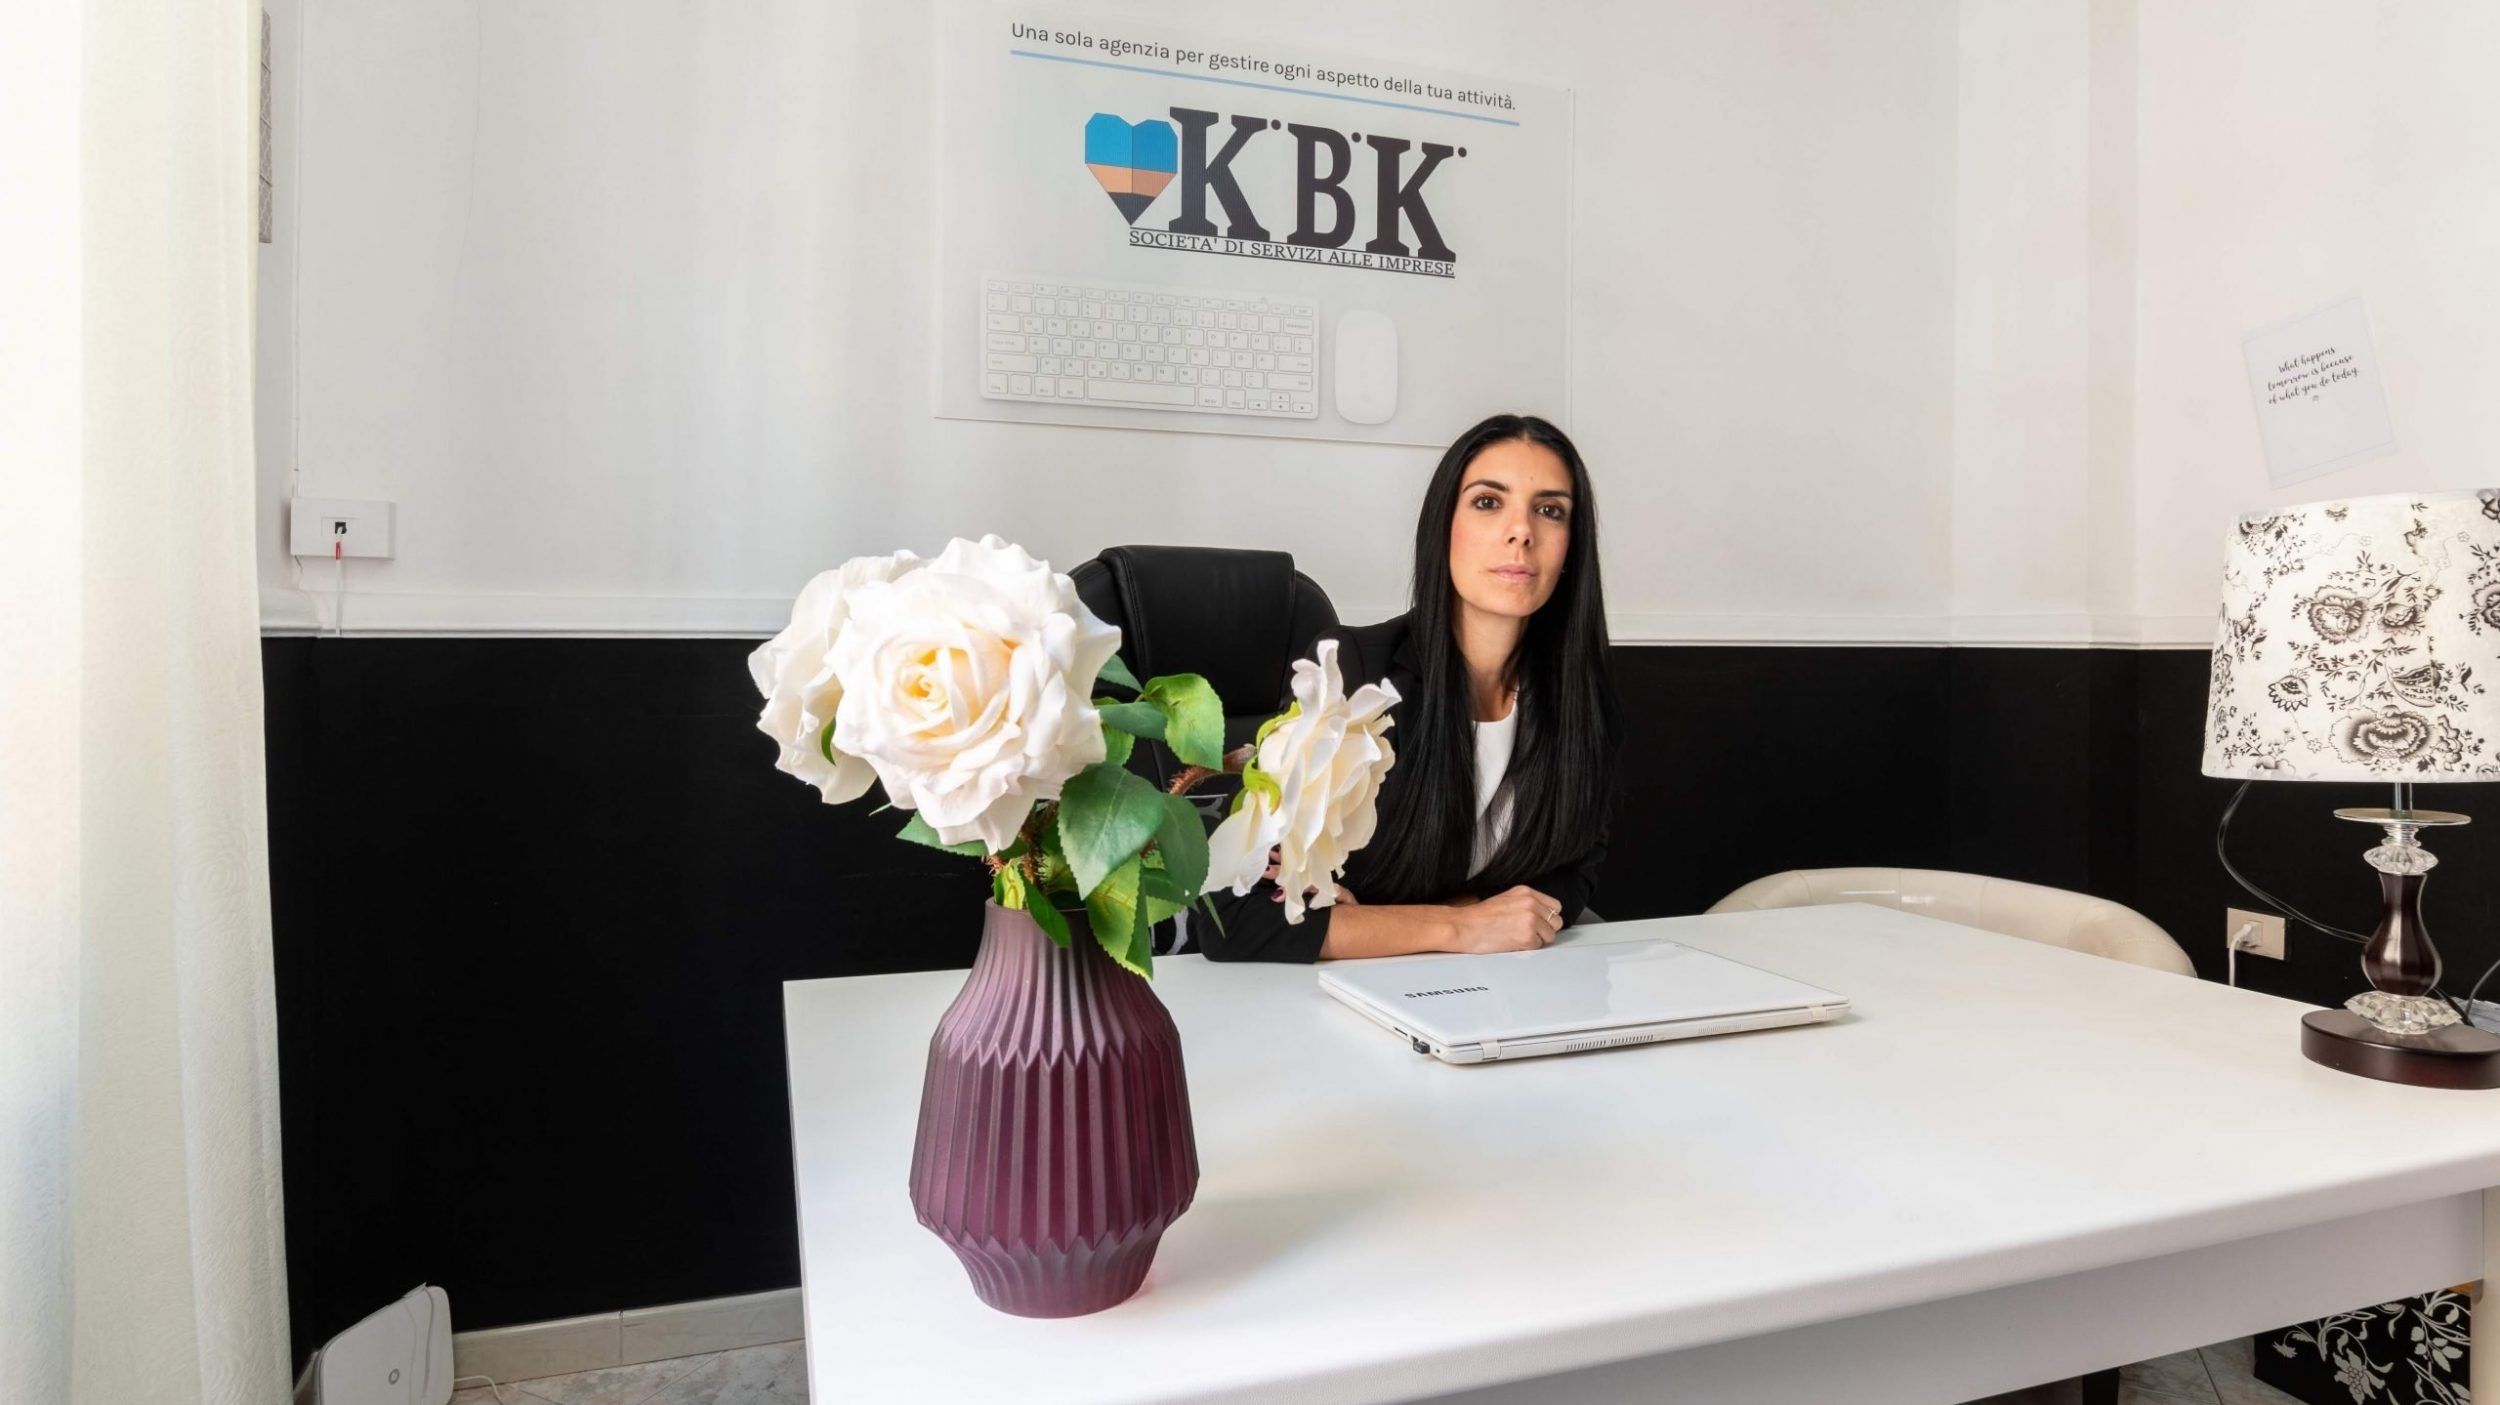 K.B.K. di Cristina Piludu